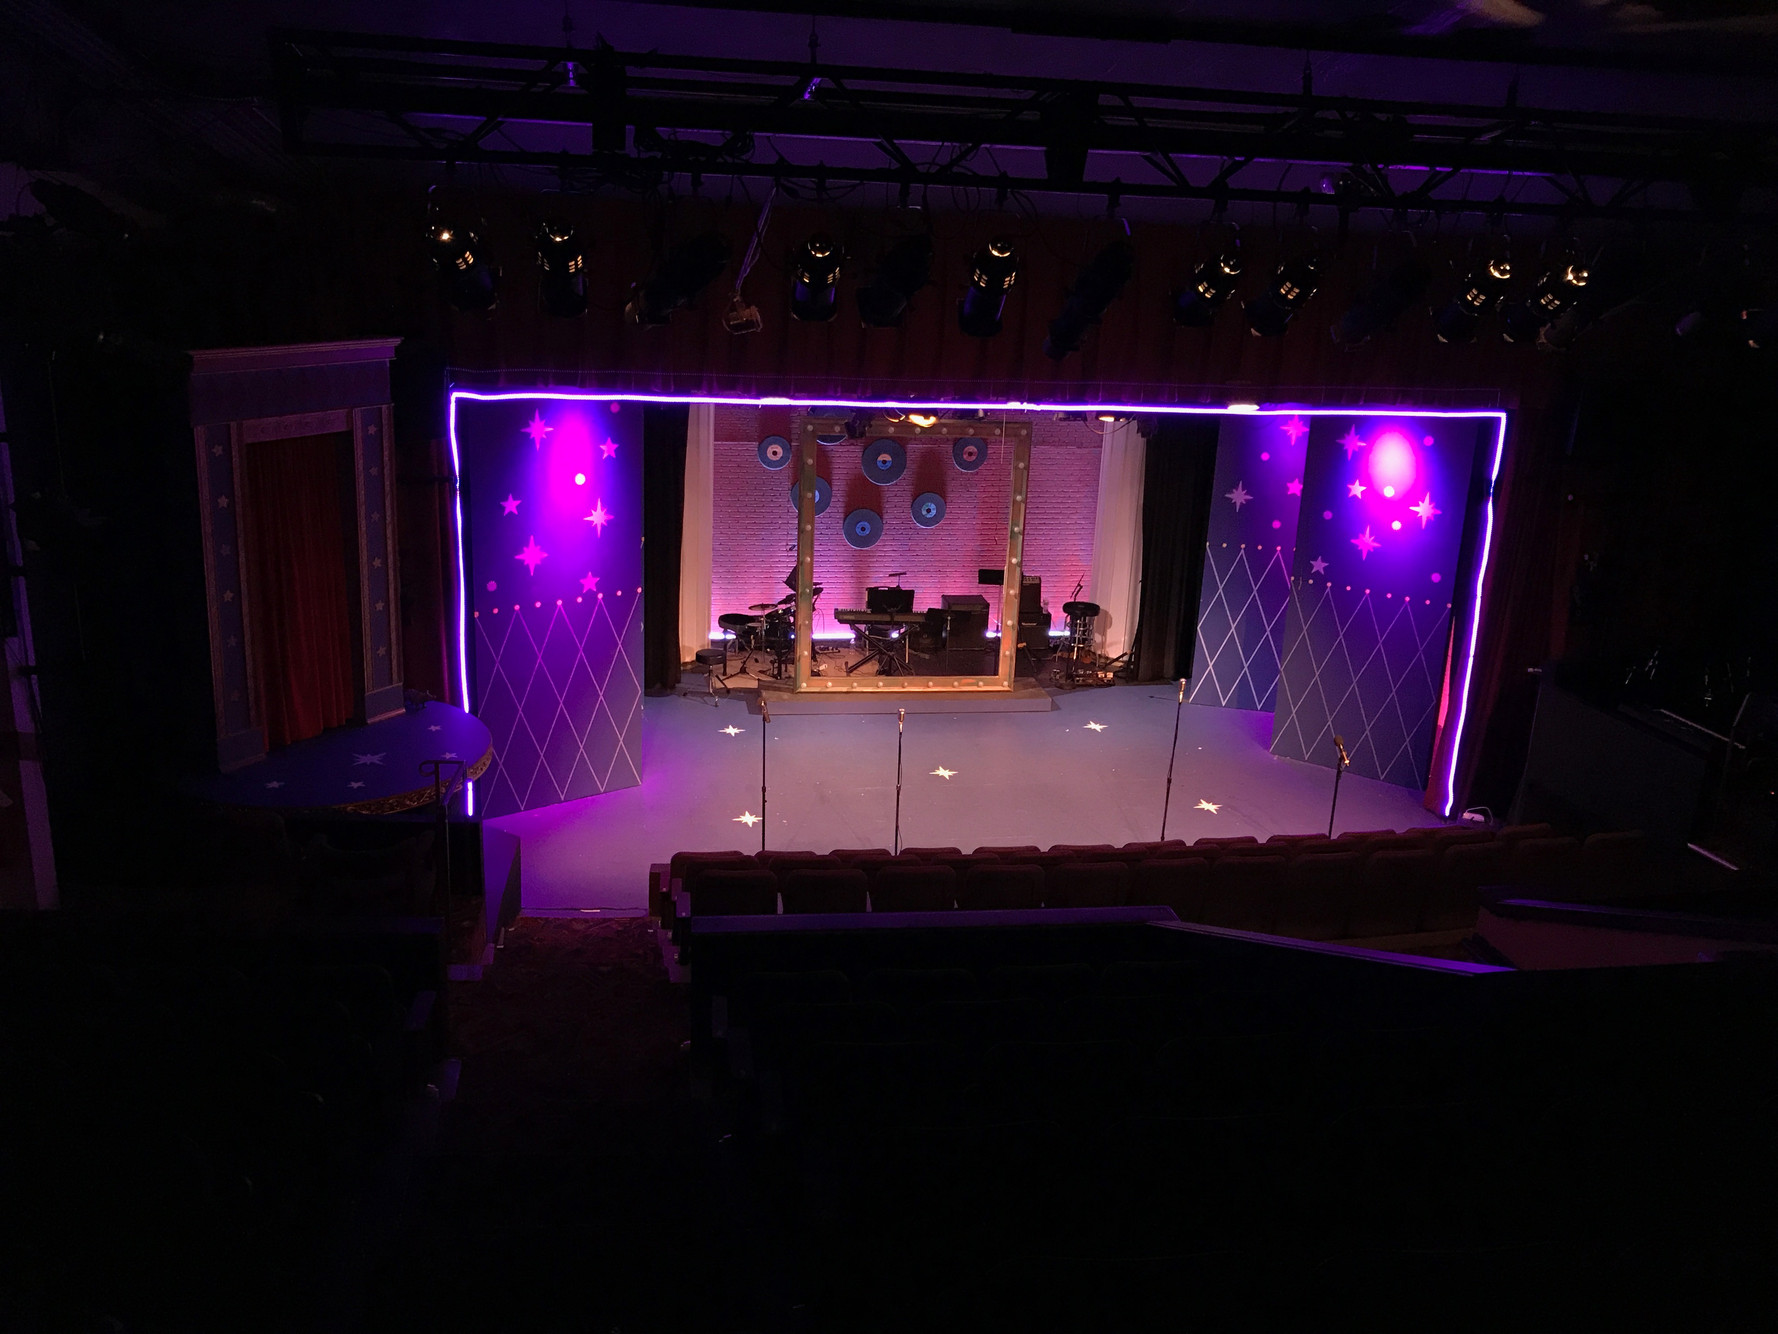 Rhino Theatre Mainstage Shows